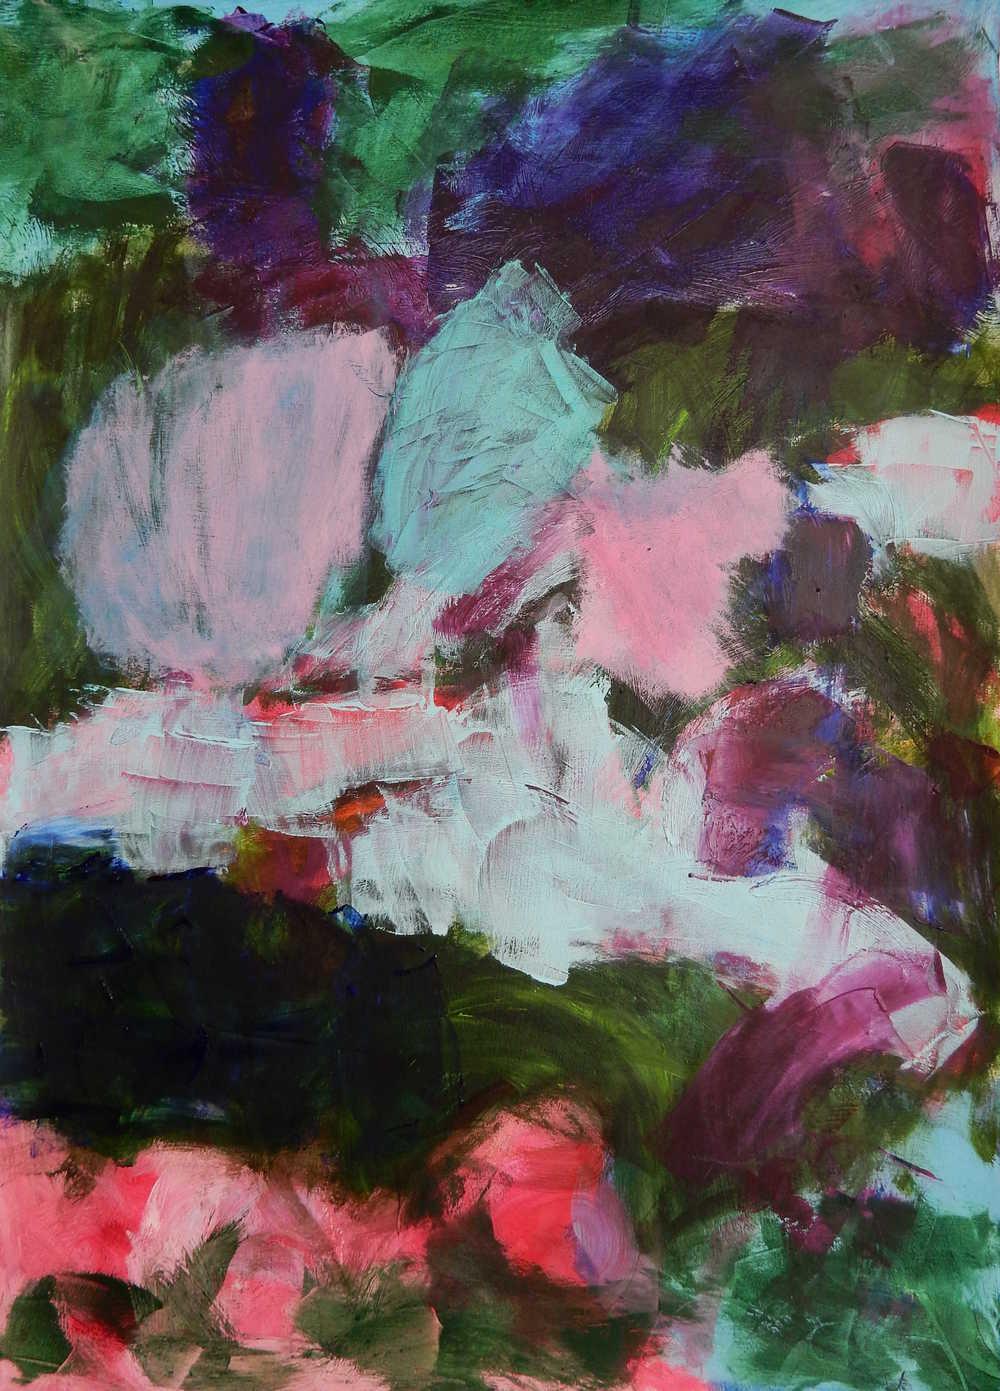 IT'S WORTH IT, Chloé Meyer, 22 x 30, oil on prepared paper